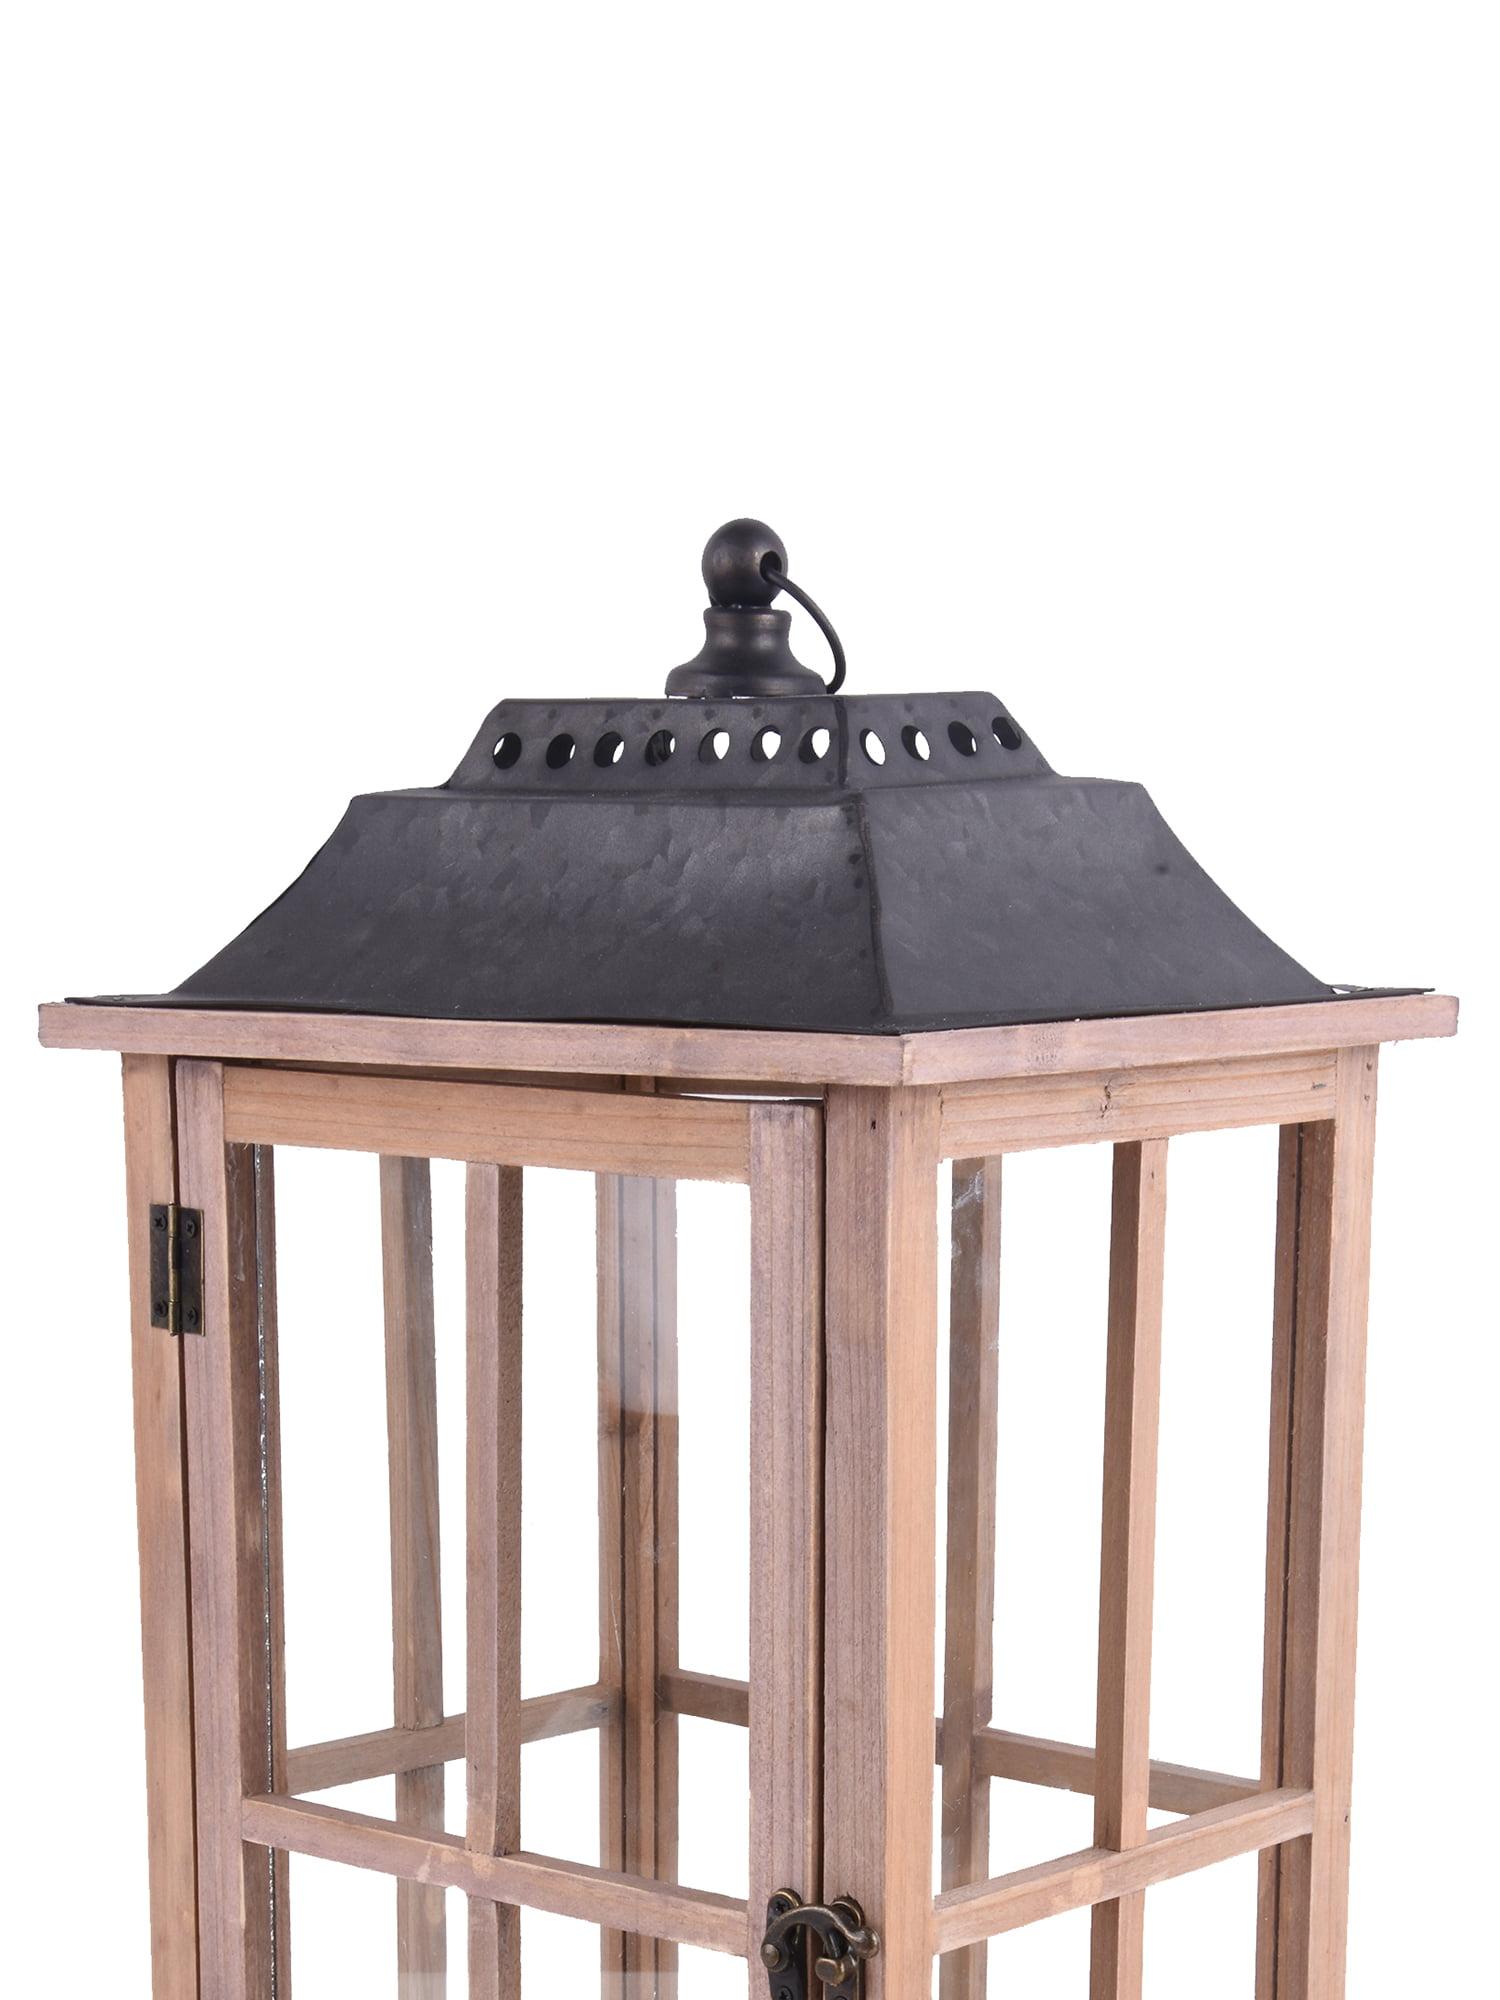 Nascar wooden lantern